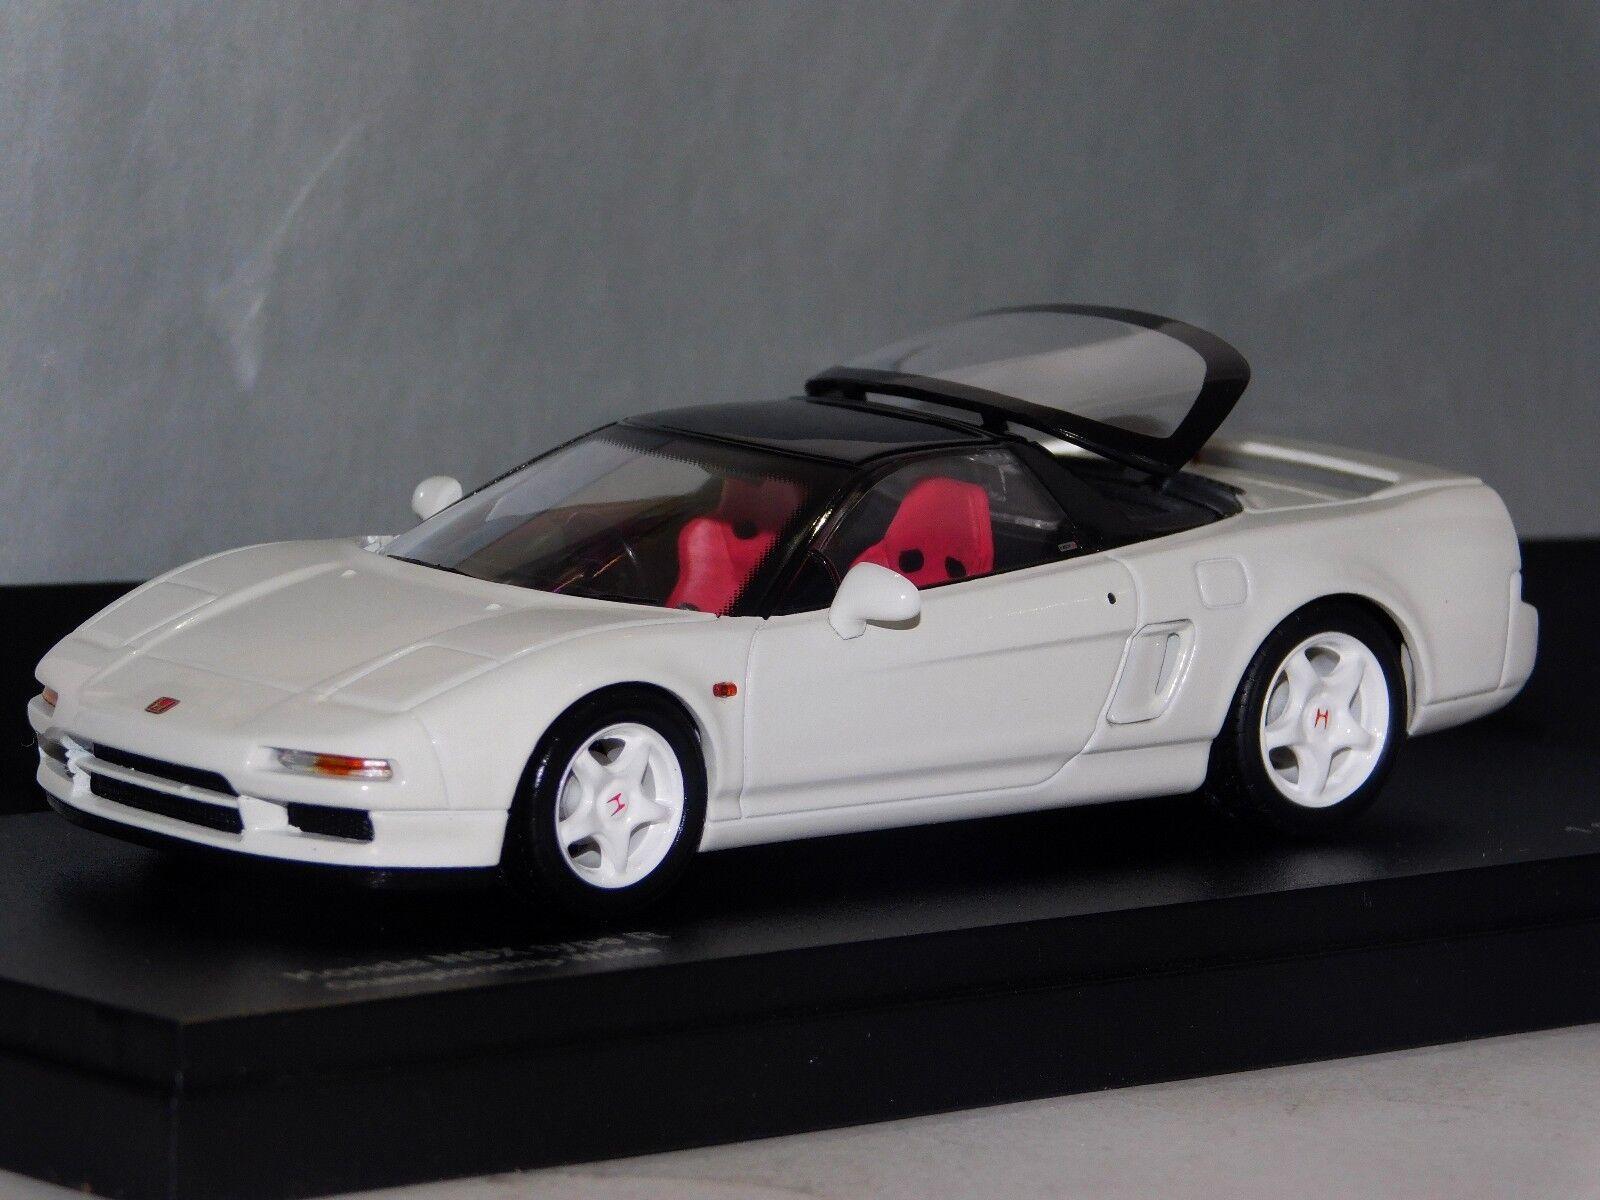 HONDA NSX  TYPE R CHAMPIONSHIP blanc OPENING REAR WINDOW KYOSHO 03322W 1 43  au prix le plus bas